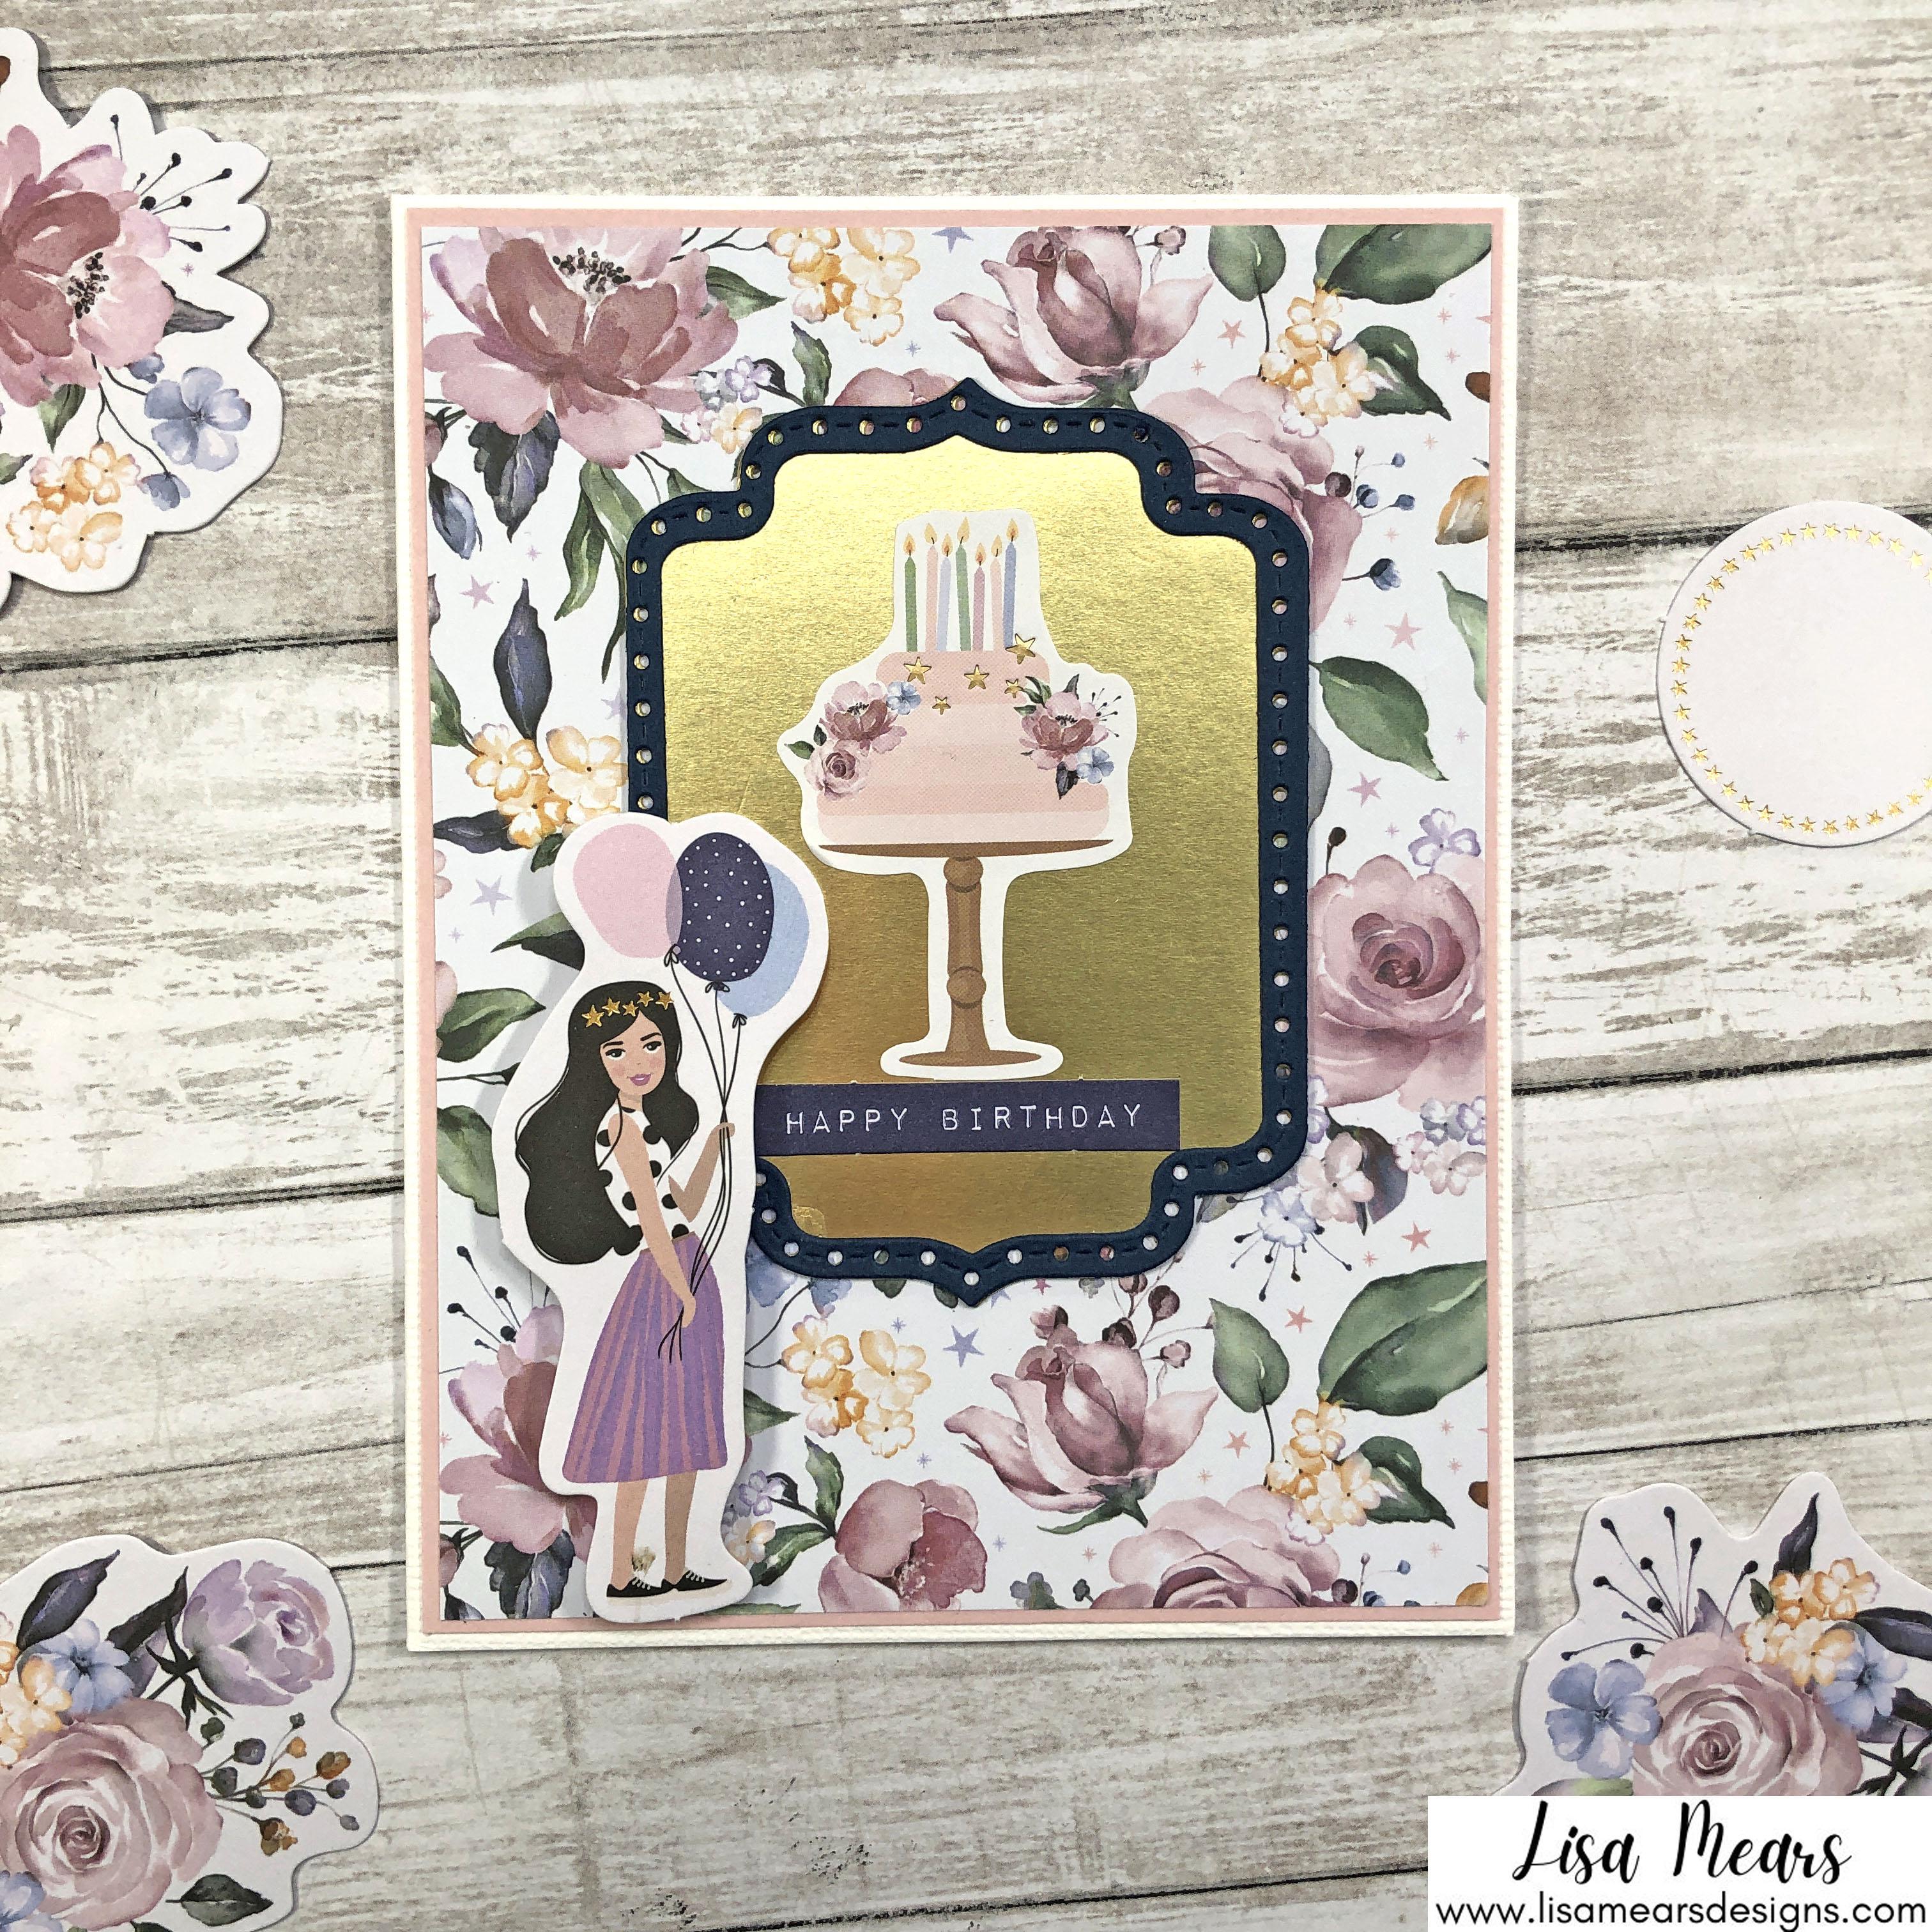 Spellbinders October 2021 Card Kit - You are Stellar! Birthday Cake Card